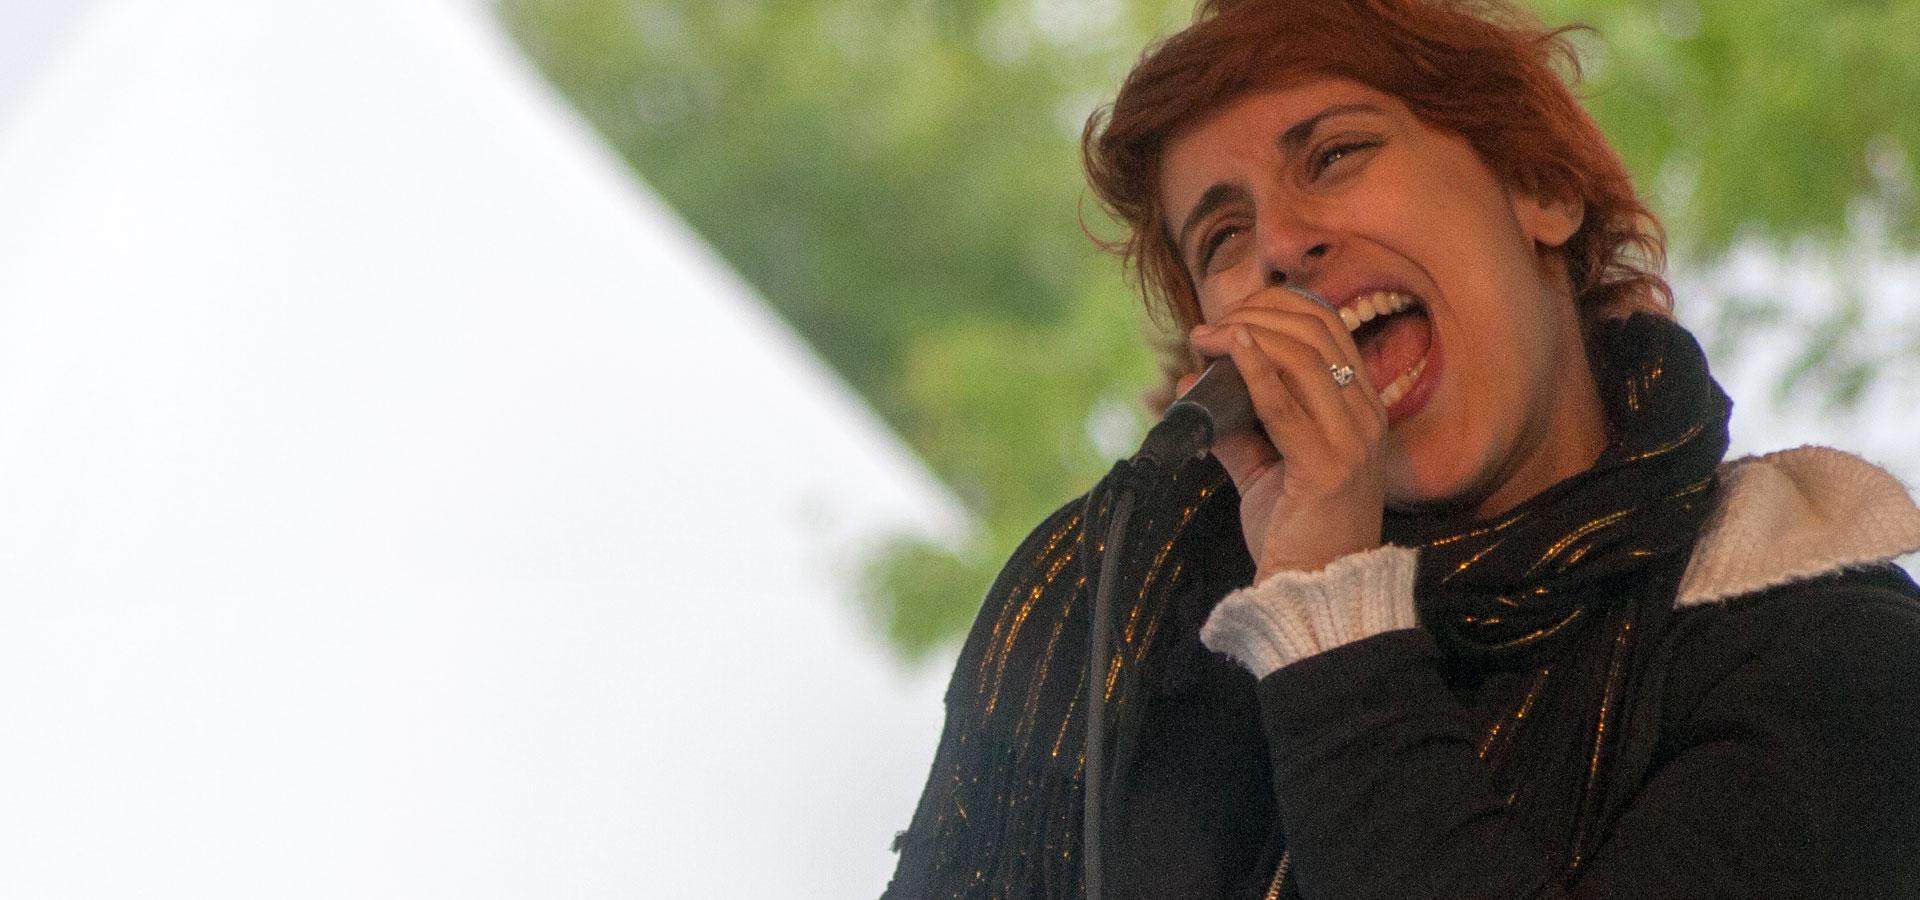 Franco Fete 2010: Queen Ka - spoken word